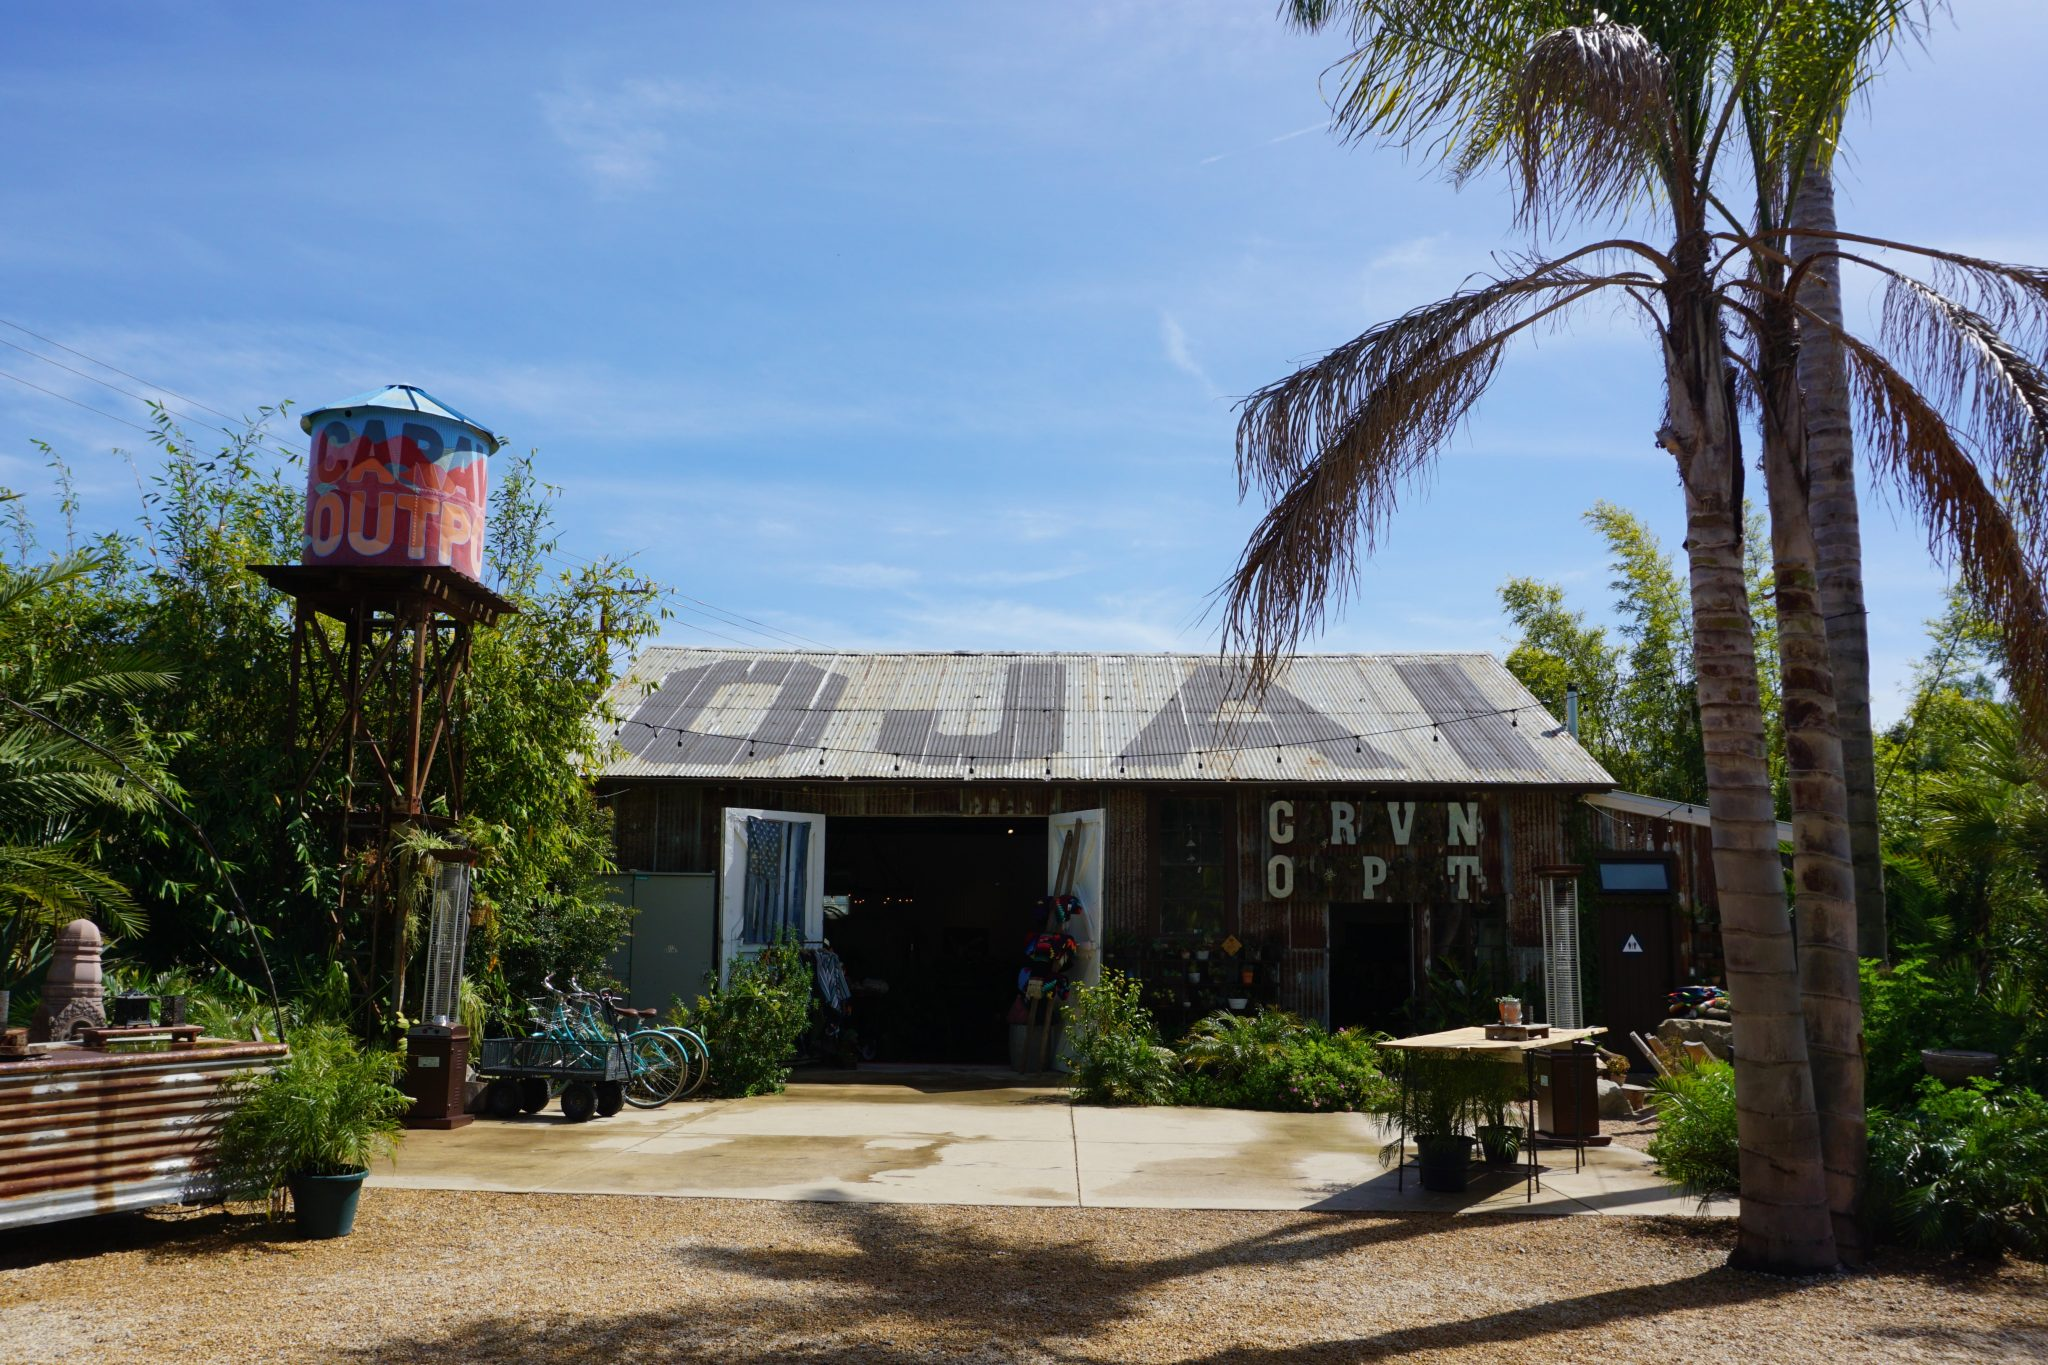 Glamping im Caravan Outpost, Ojai | hollywoodreporterin